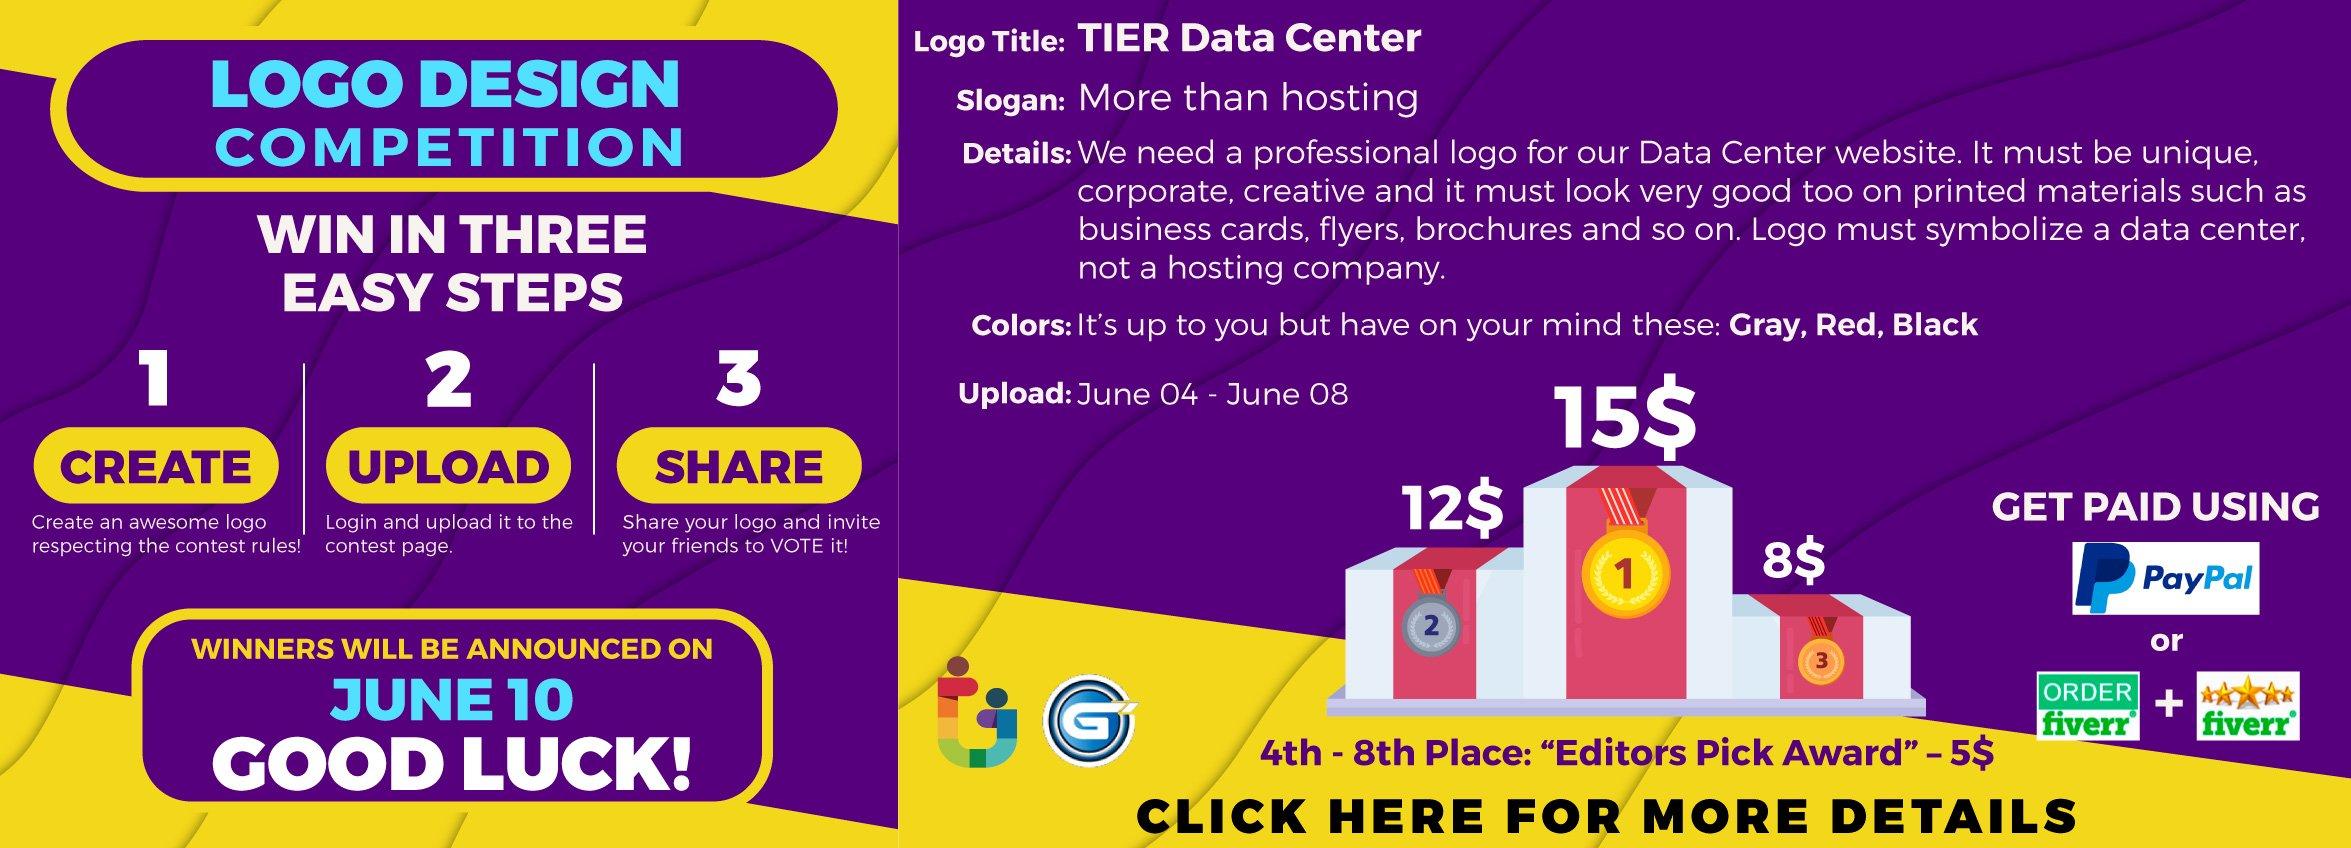 Tier Data Center Logo Design Competition